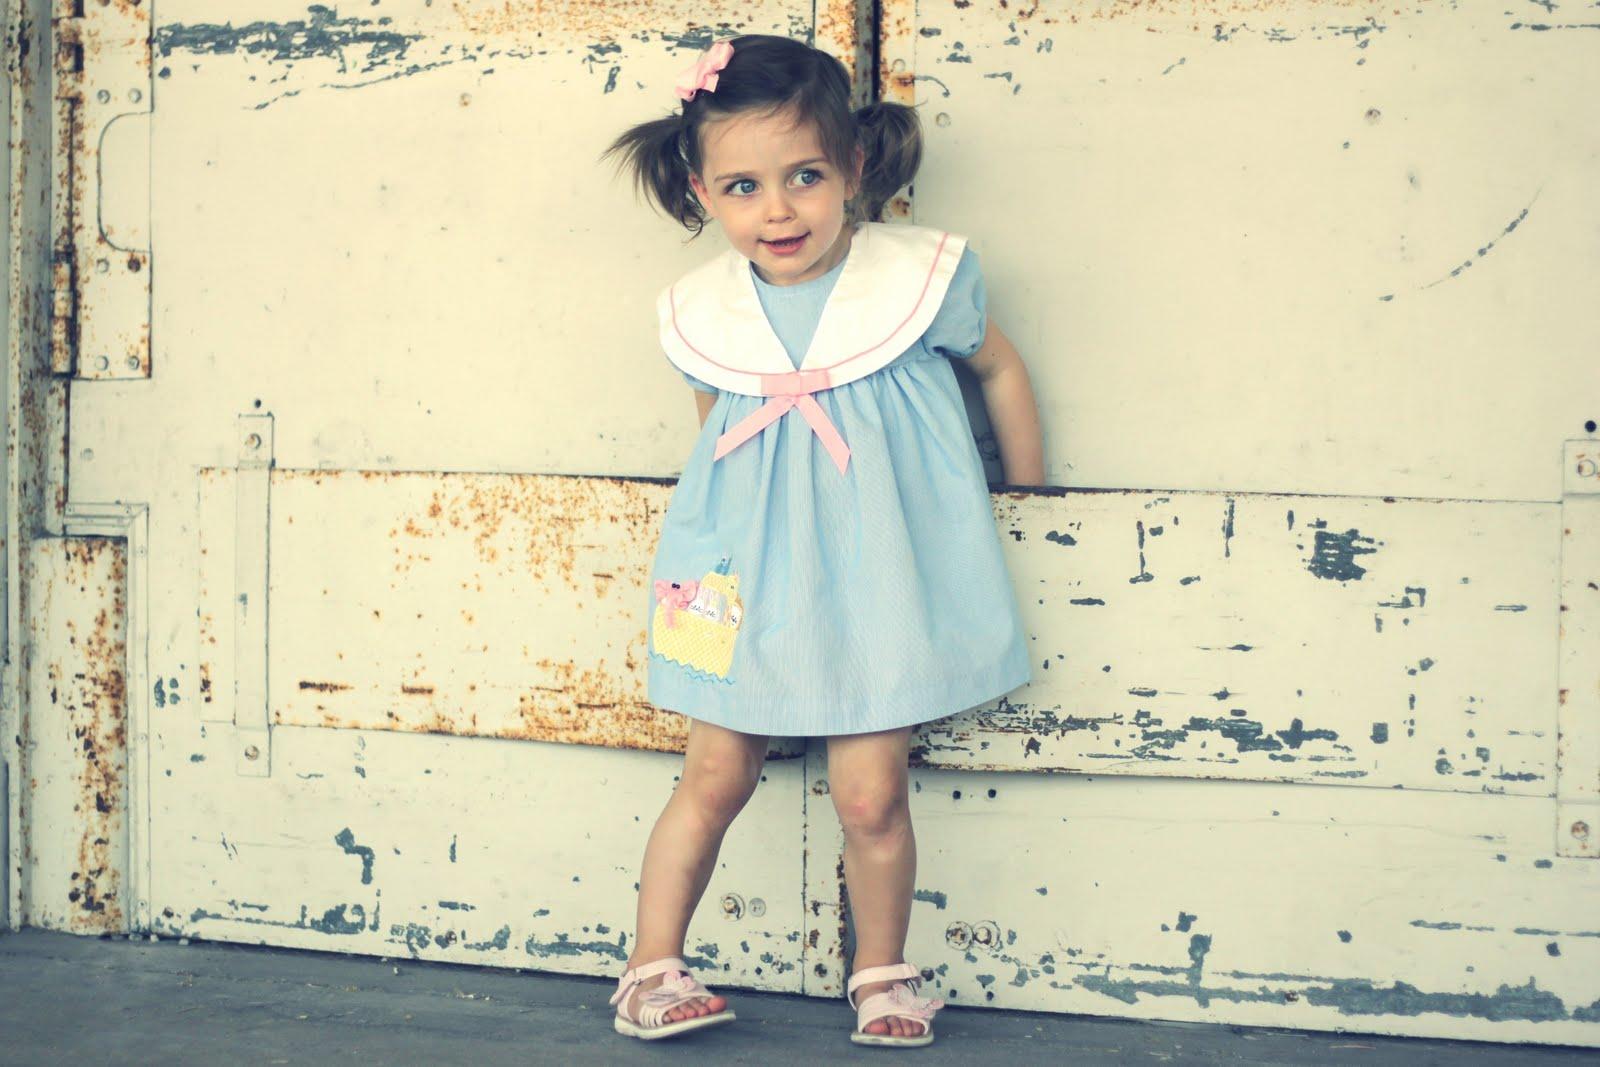 Hart  Sew  Vintage Baby Clothing Little Vintage Style V15-6003